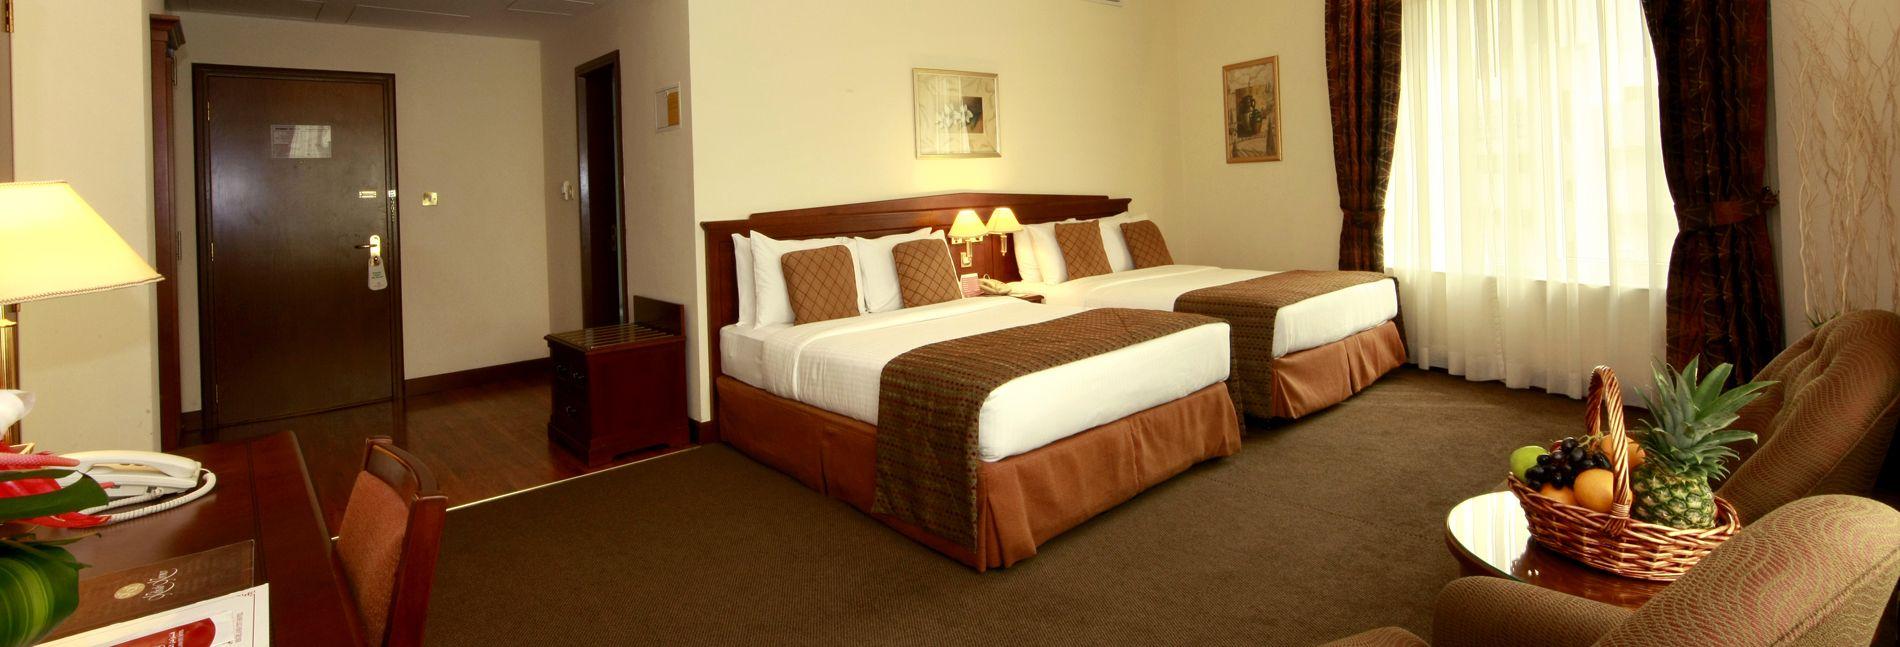 Book 3 Star Dubai Hotels Online With Best Hotel Deals From Howard Johnson Visit Http Www Hojoburdubai